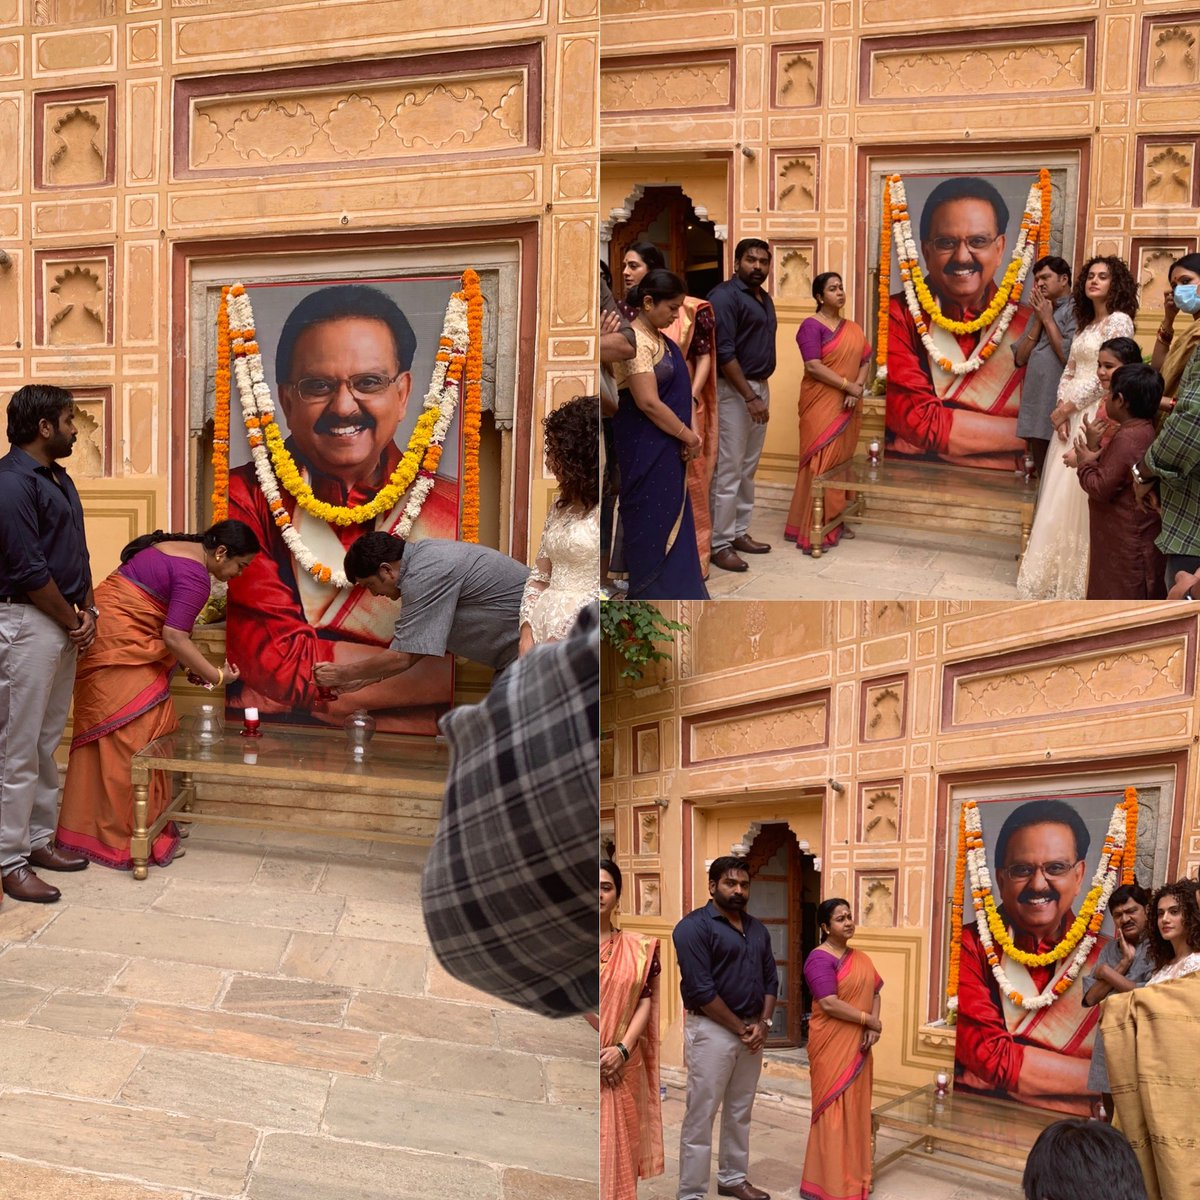 #SPBalasubrahmanyam  a tribute by the unit in Jaipur @VijaySethuOffl  #TapseePannu  #rajendraprasad https://t.co/14cqwMxNR2